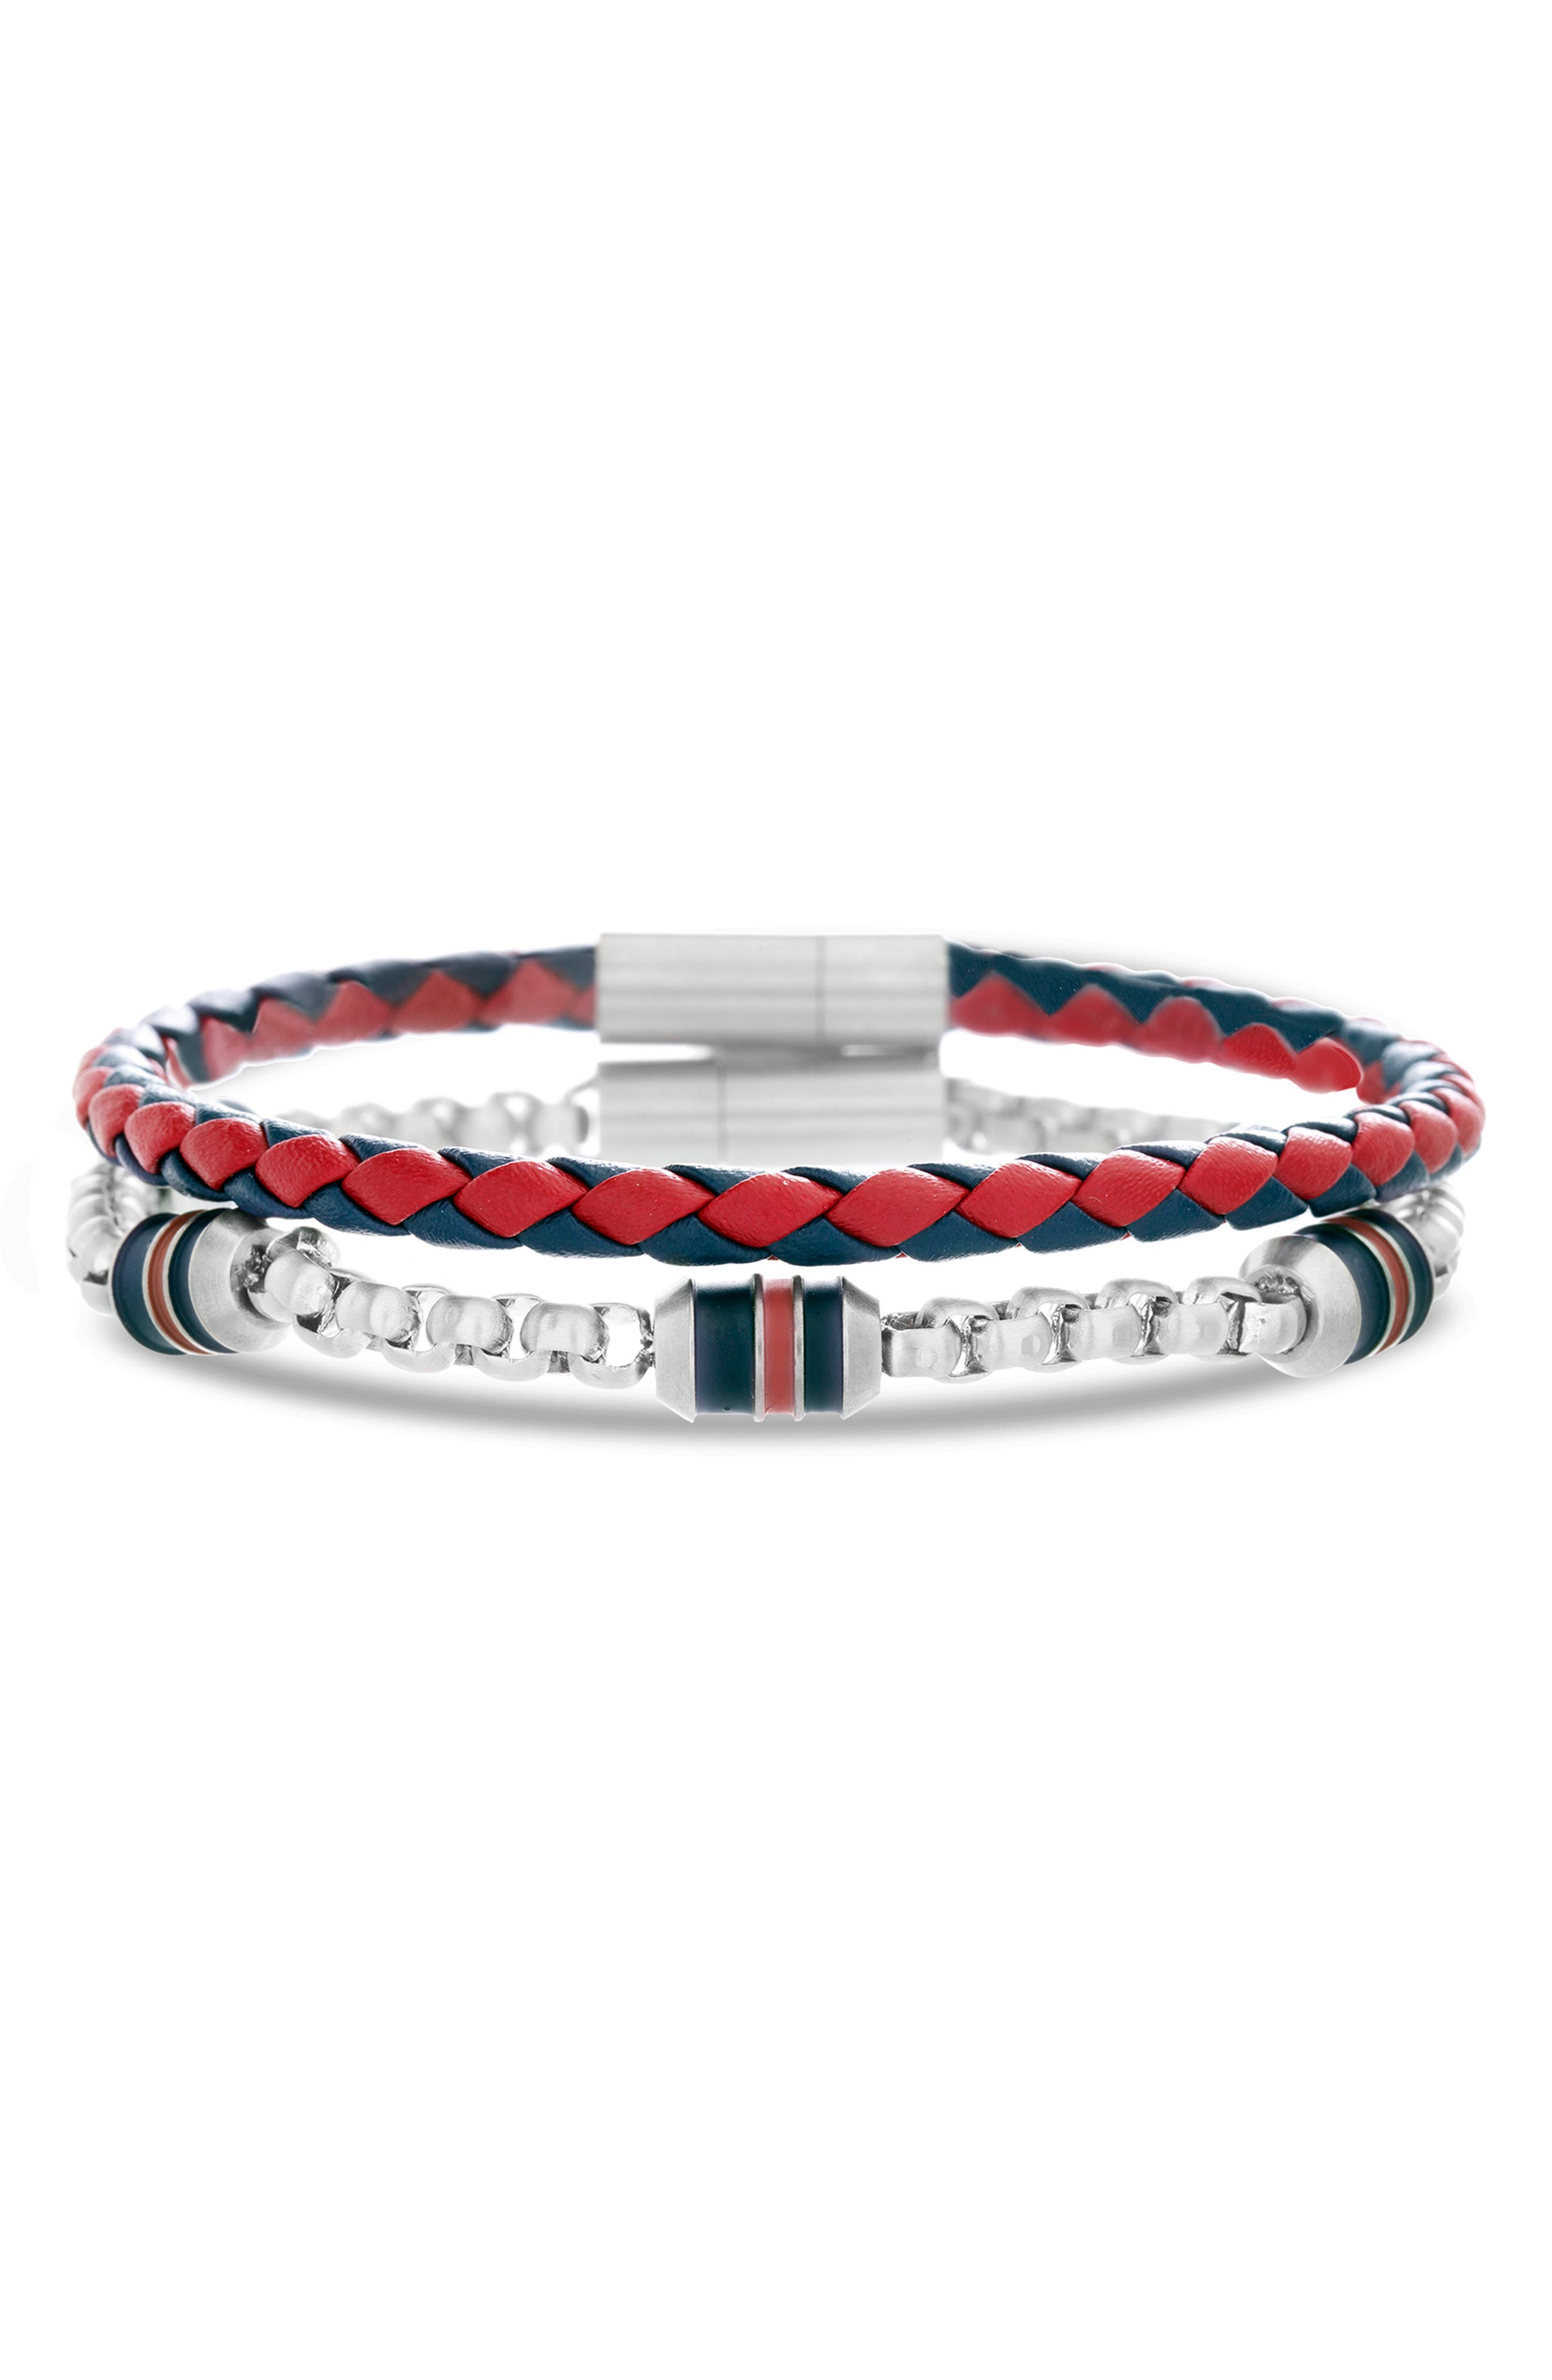 Leather & Chain Bracelet Set,                             Main thumbnail 1, color,                             RED/ BLACK